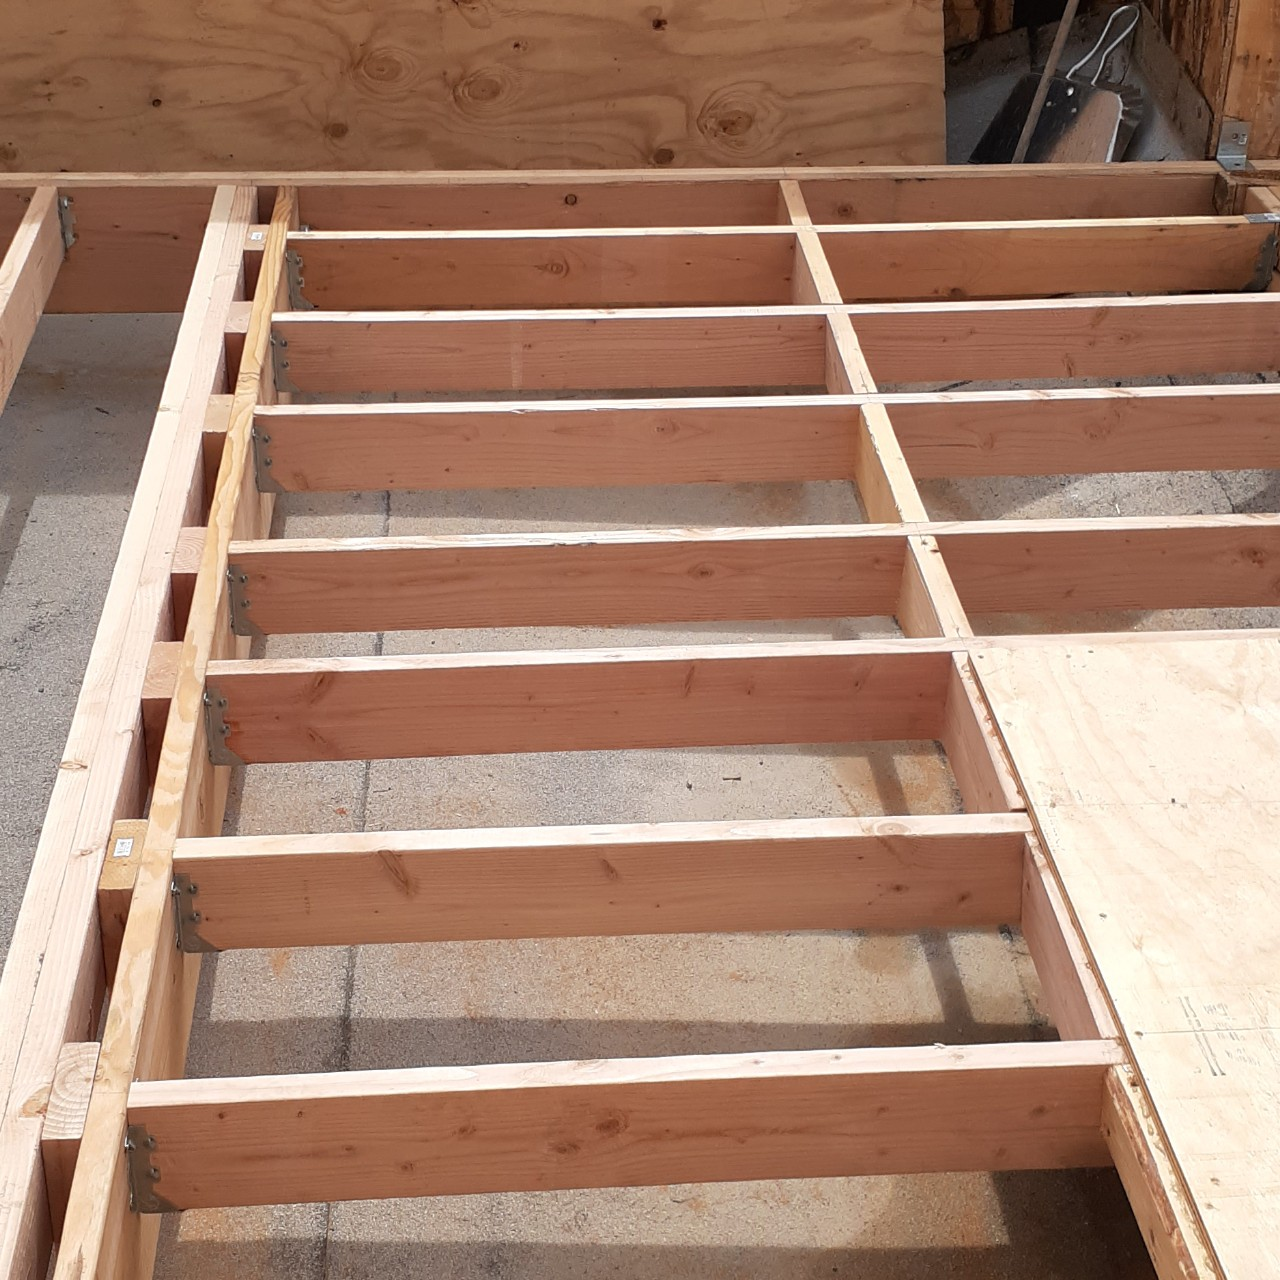 carpentry-wood-framing-second-floor-home-addition--framing-80